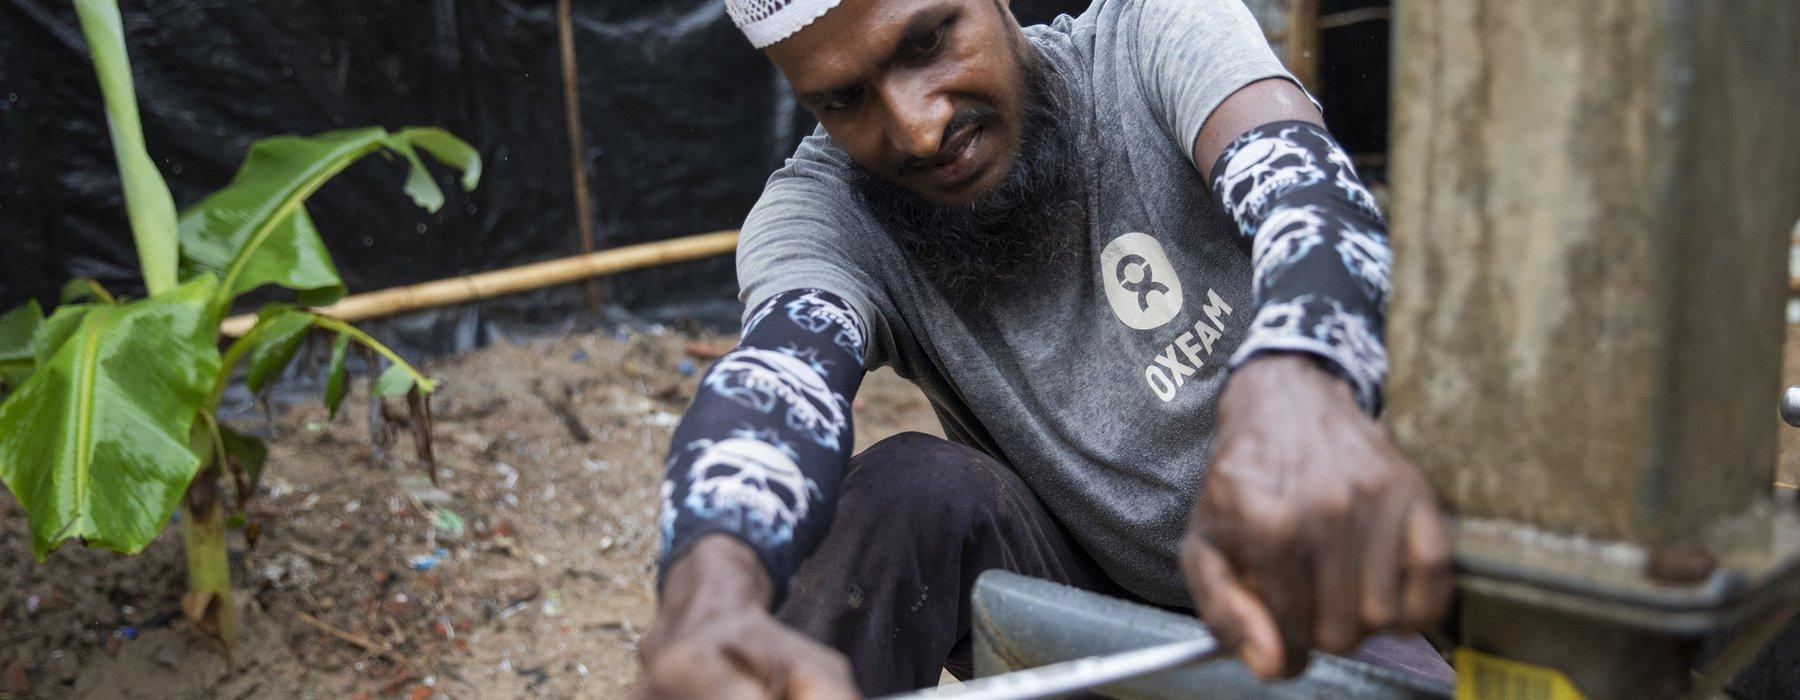 Cyclone Bulbul Preparations - Mechanic fixing hand pump